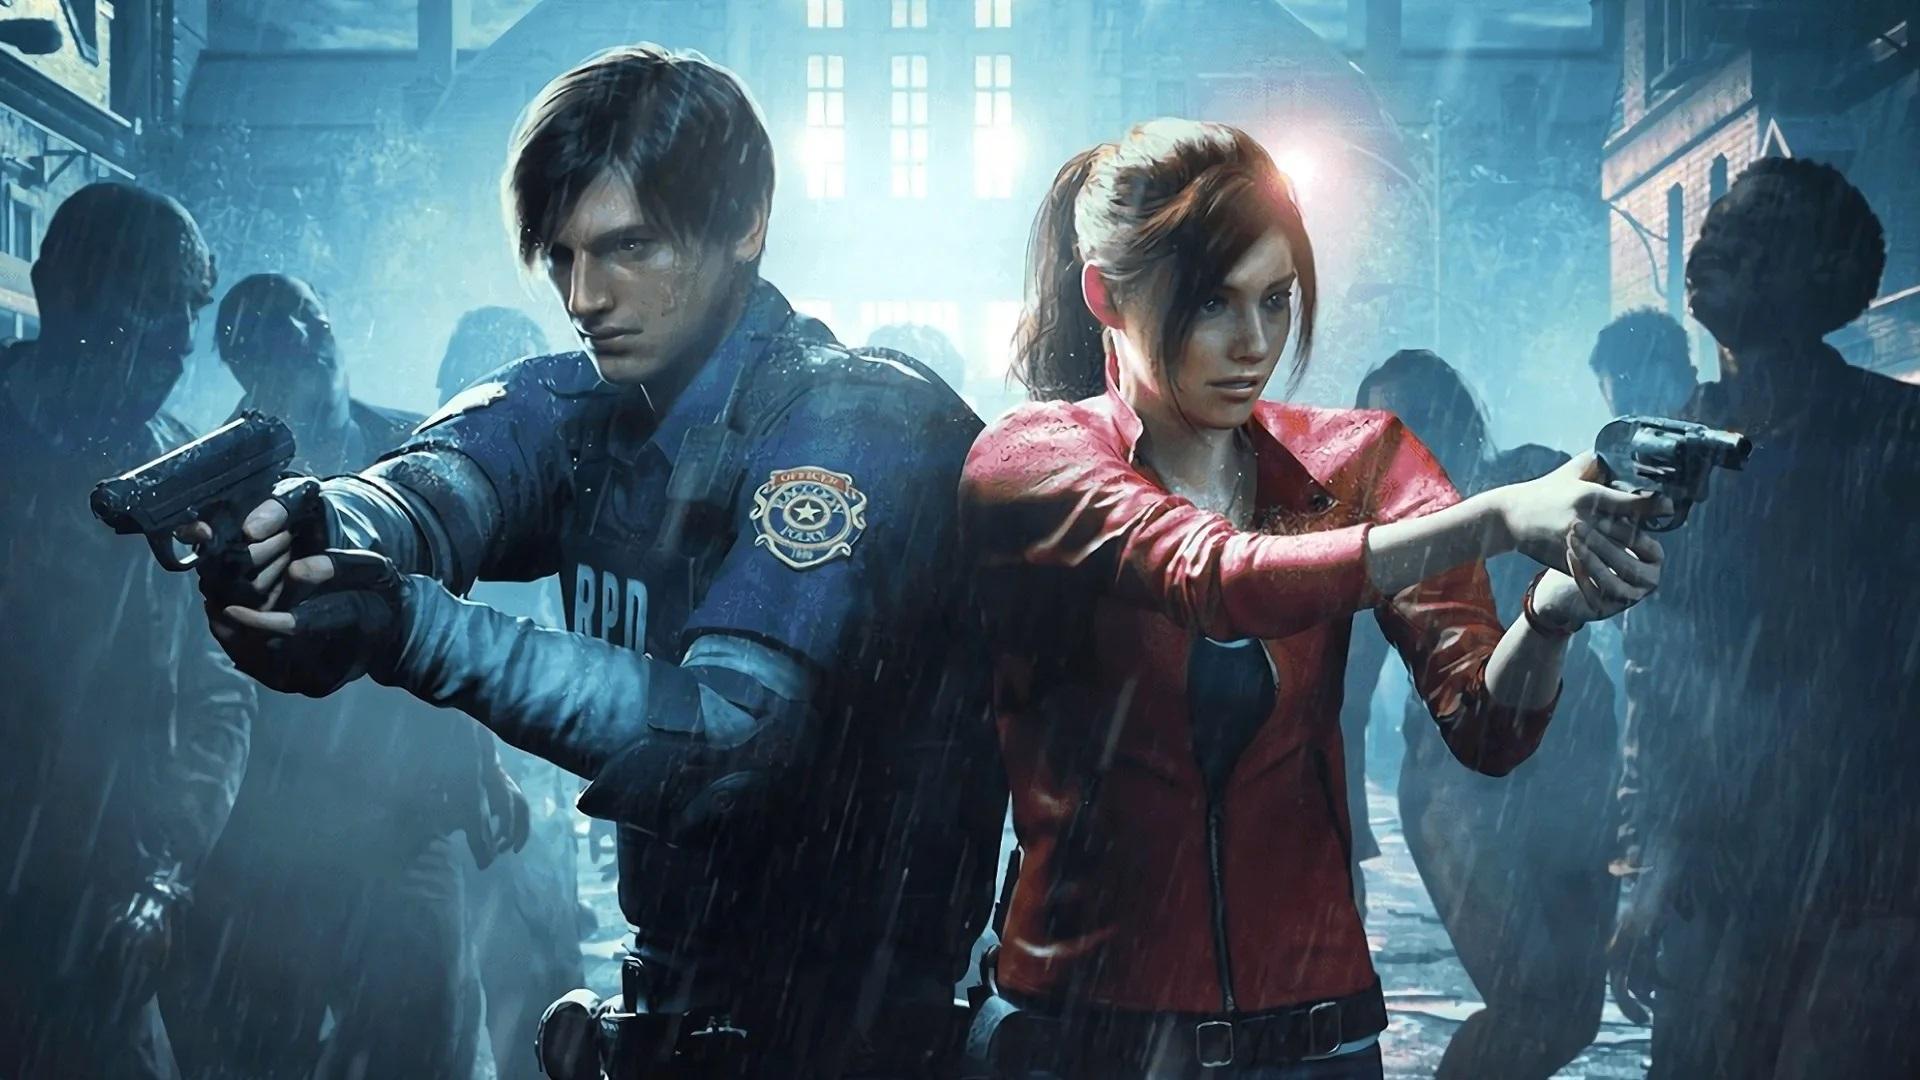 Resident Evil: zwei Bilder vom Anime enthüllt